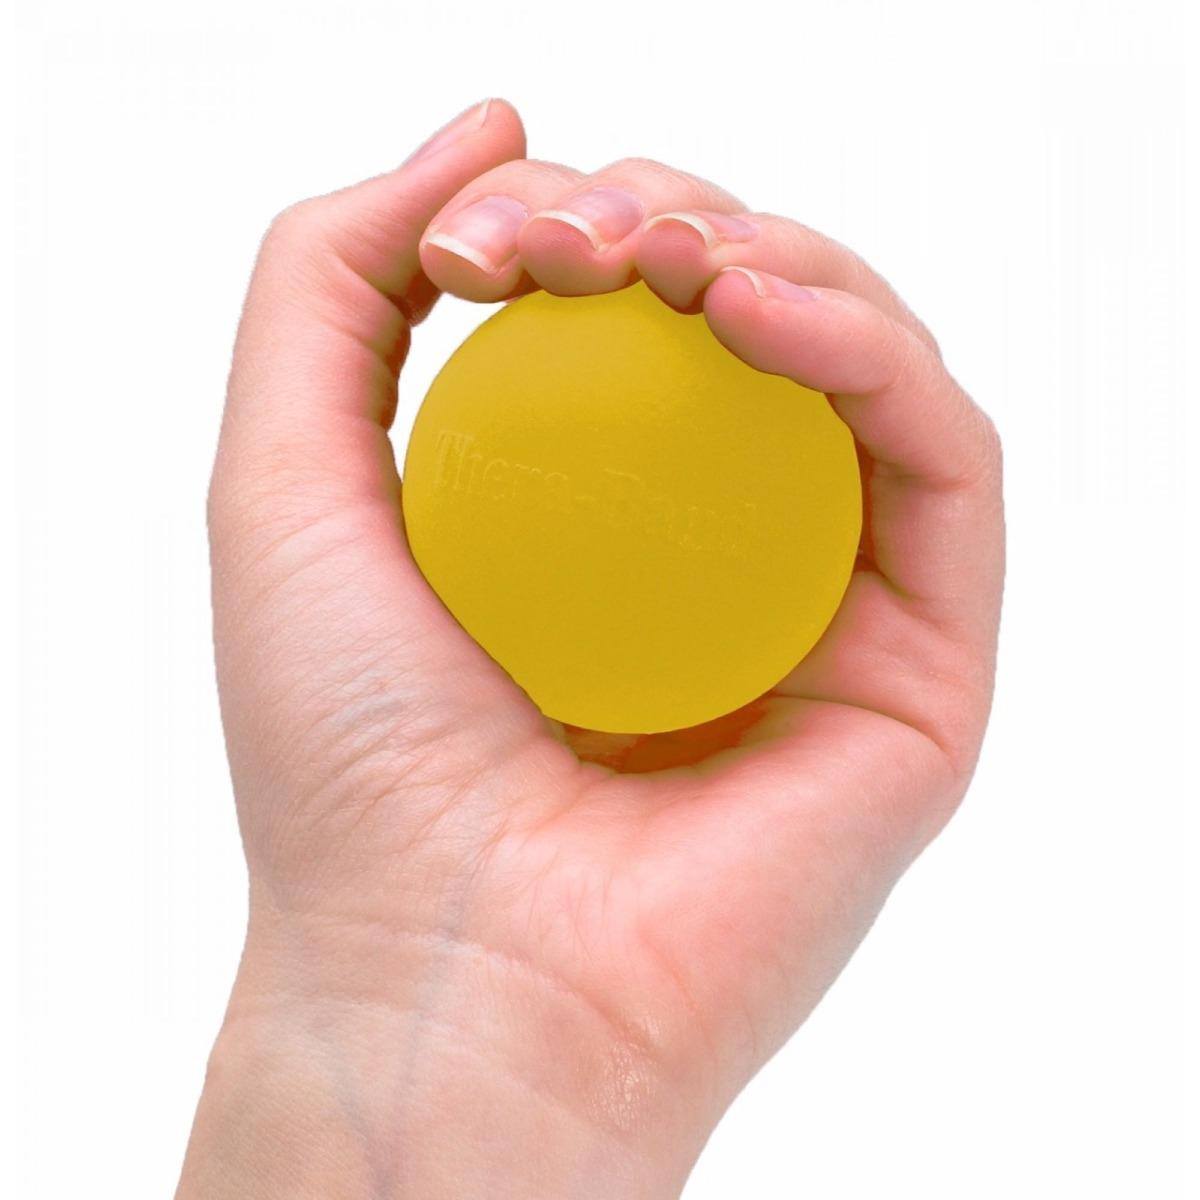 TheraBand Hand Exerciser, Level 1, Yellow, Extra Soft